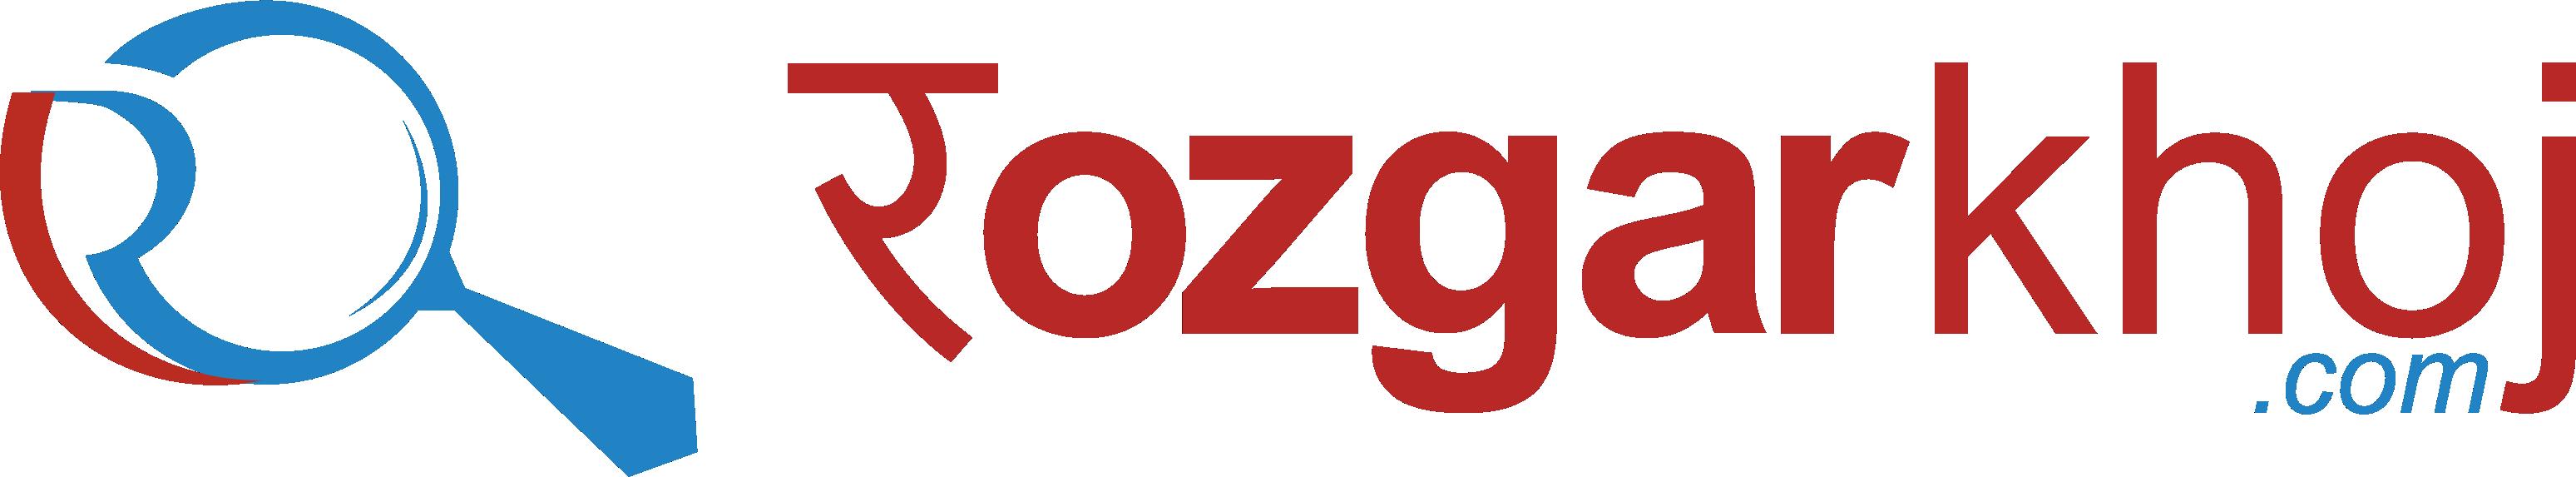 Rozgarkhoj Logo